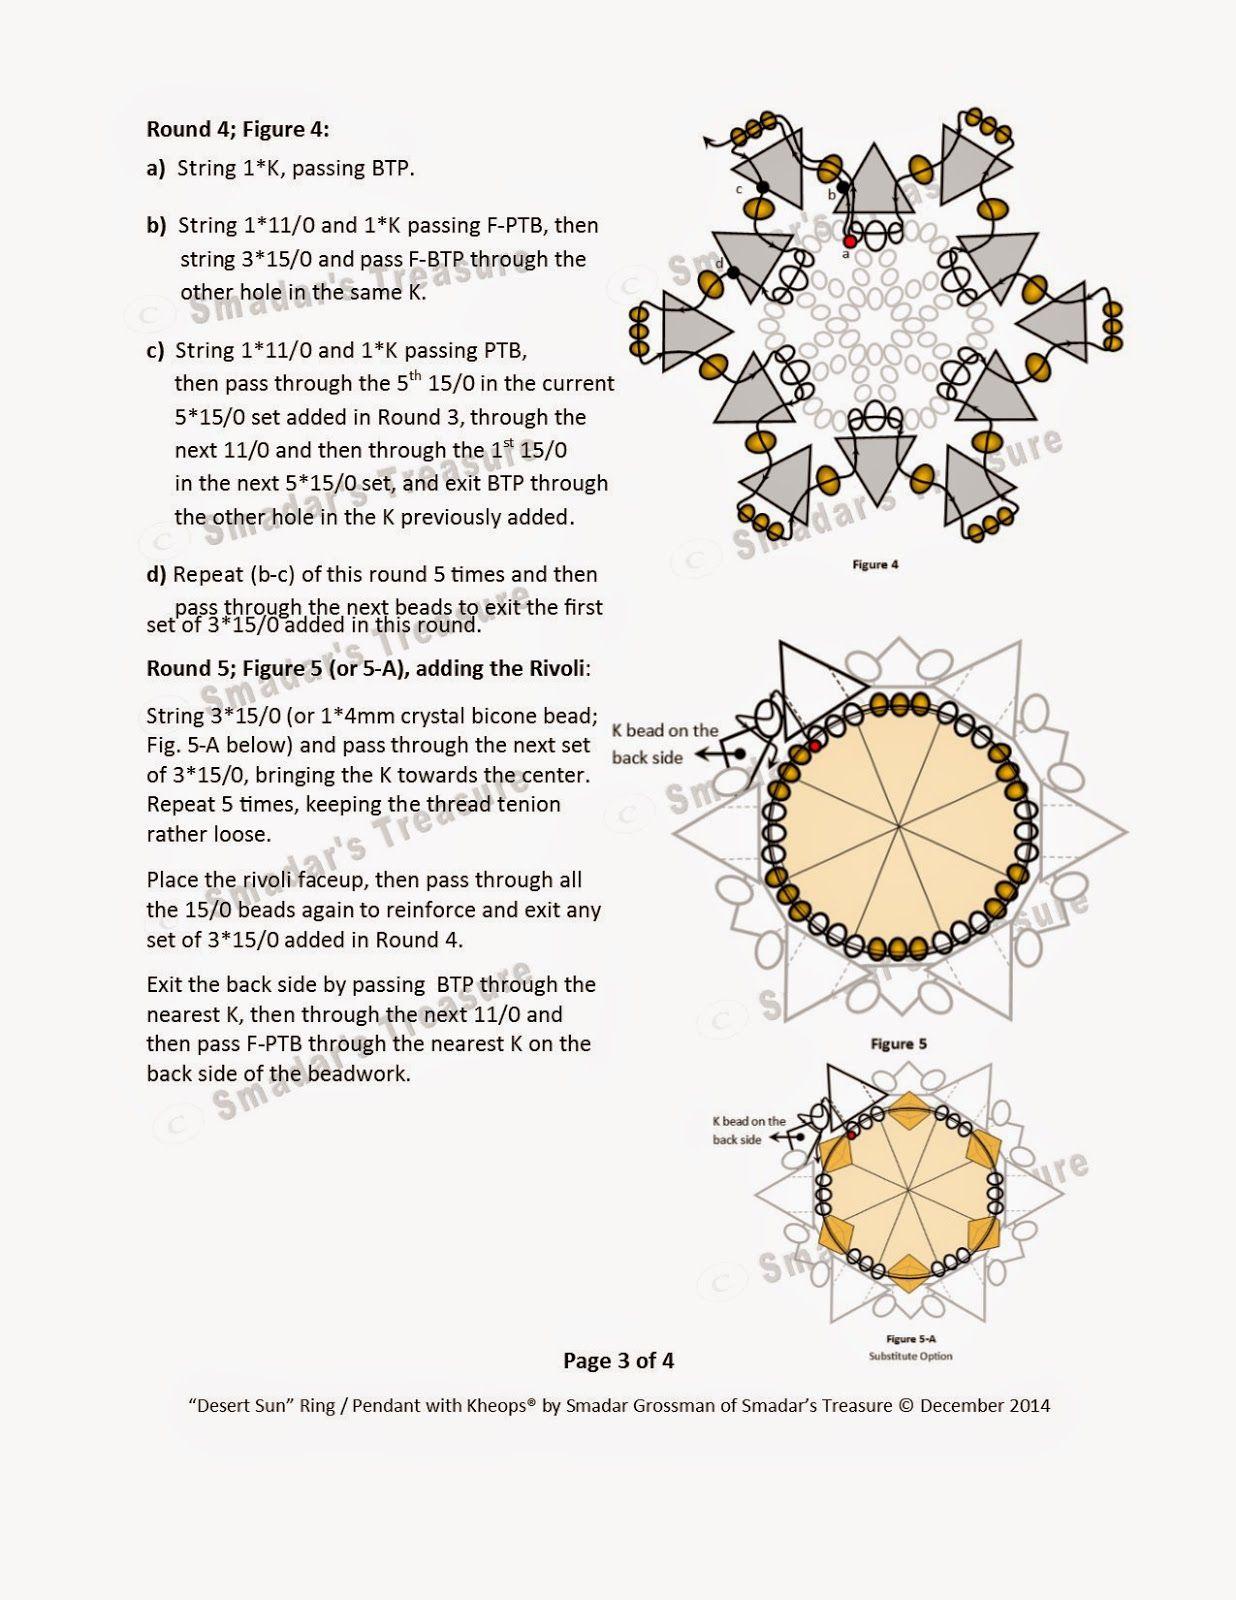 Desert Sun 3 Smadar's Treasure: Free Pattern with Kheops par Puca Beads